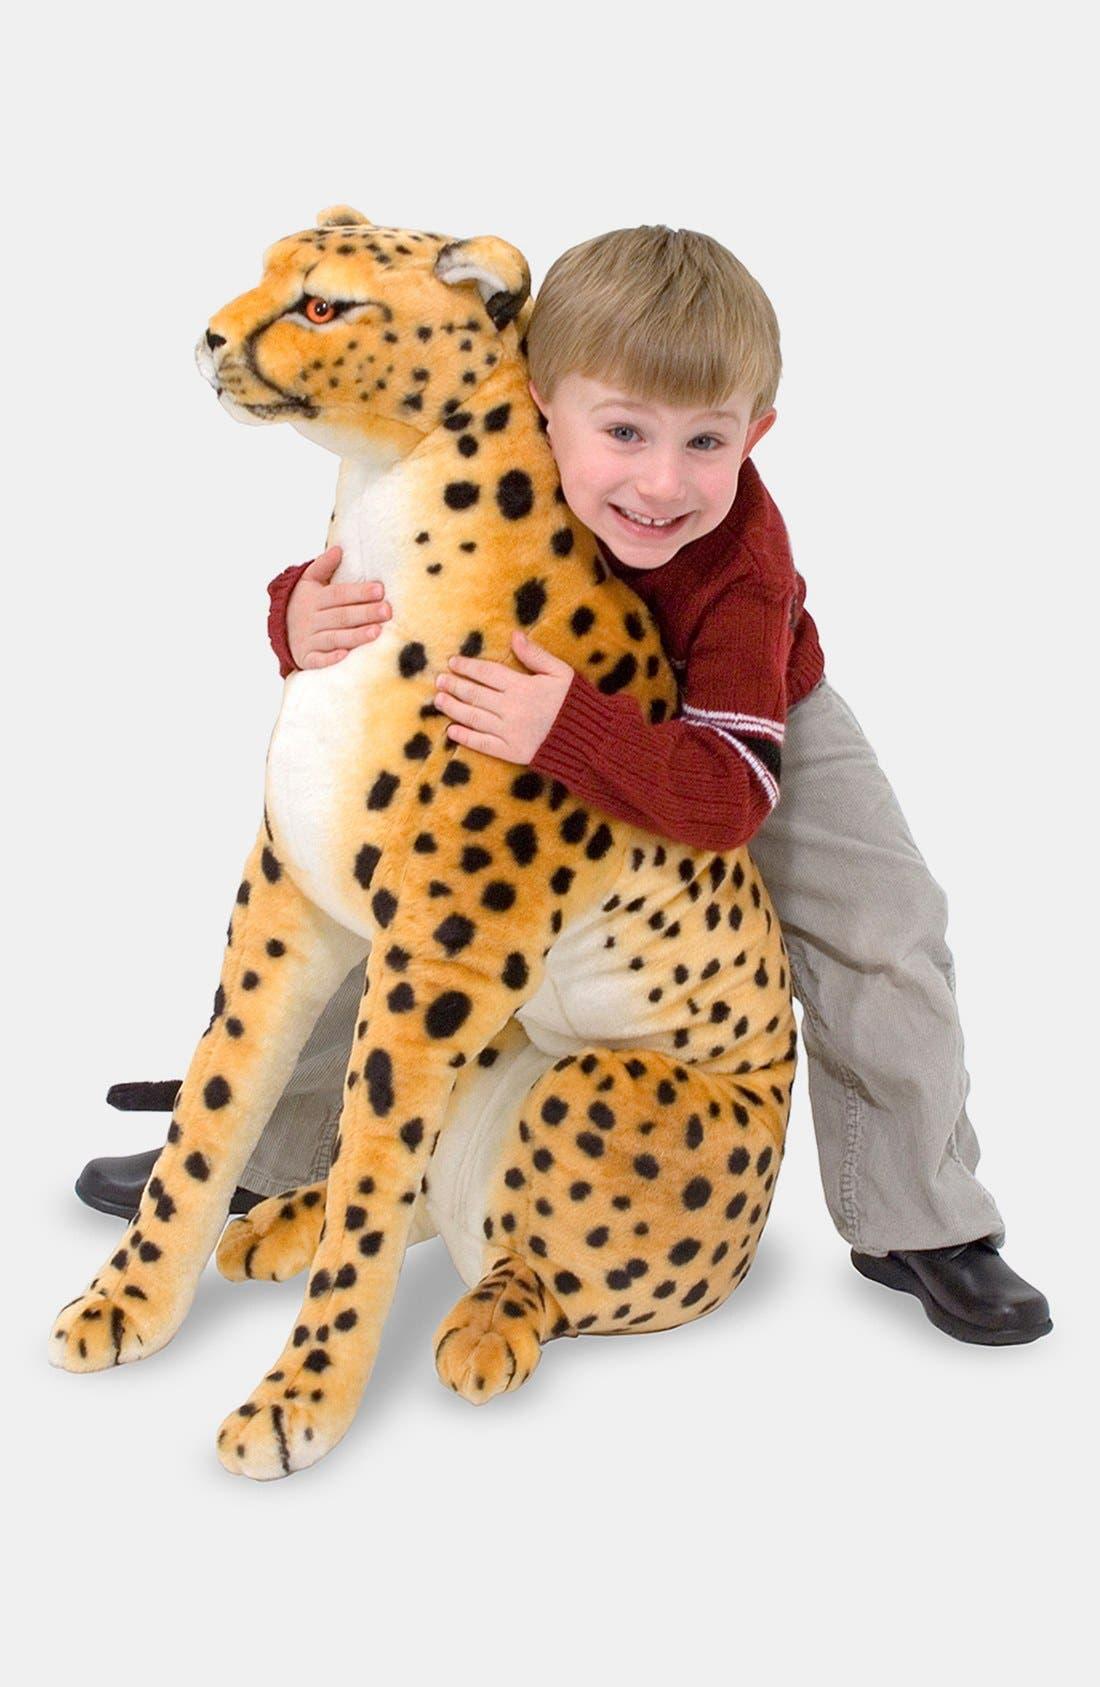 Melissa & Doug Plush Cheetah Stuffed Animal